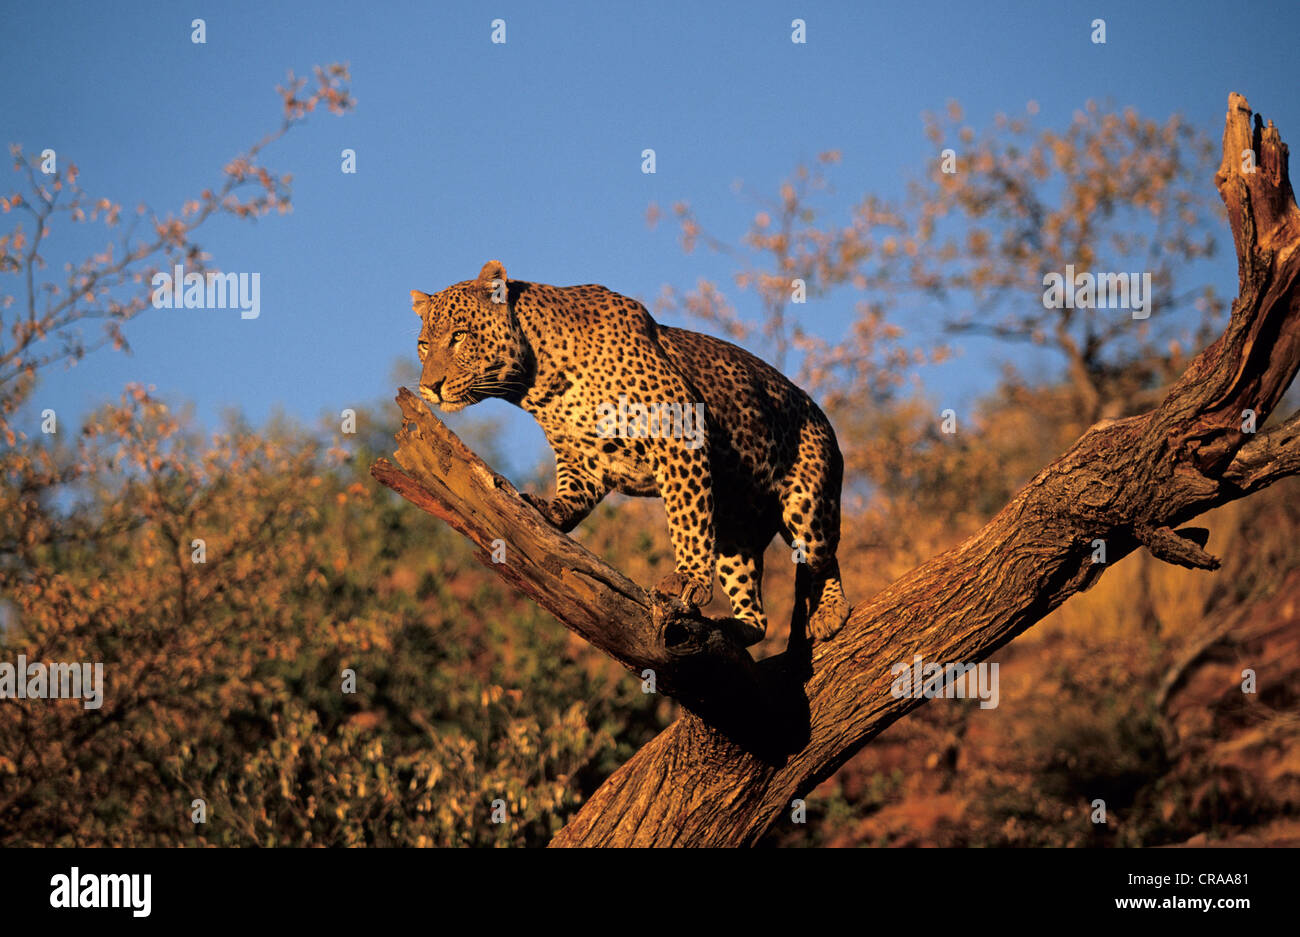 Leopard (Panthera pardus), Okonjima, Namibia, Africa - Stock Image